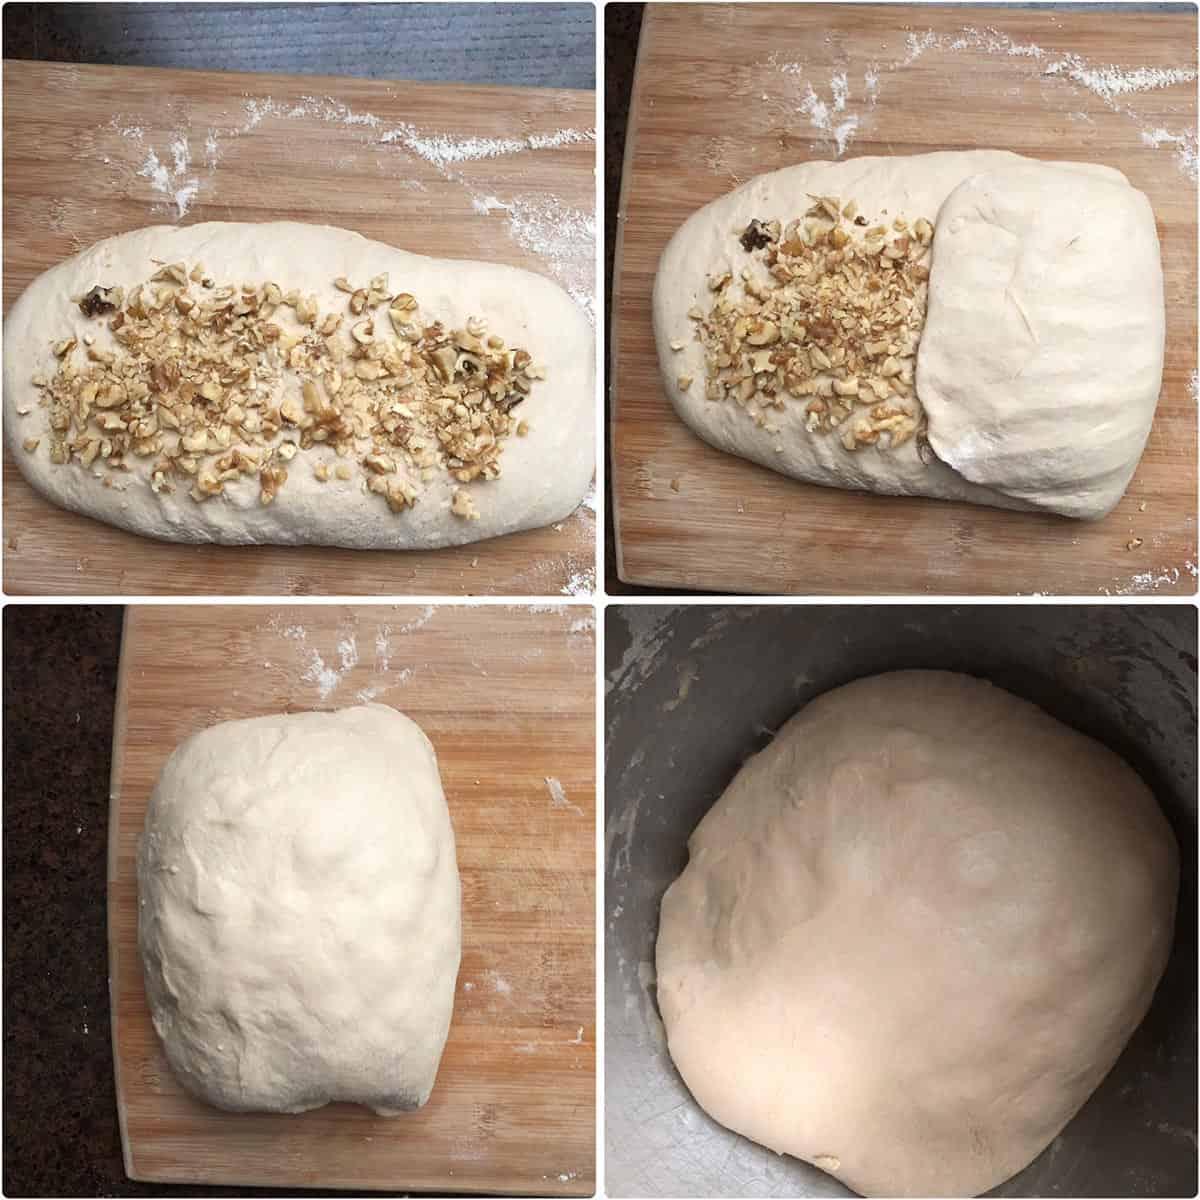 Folding in chopped walnuts into the dough